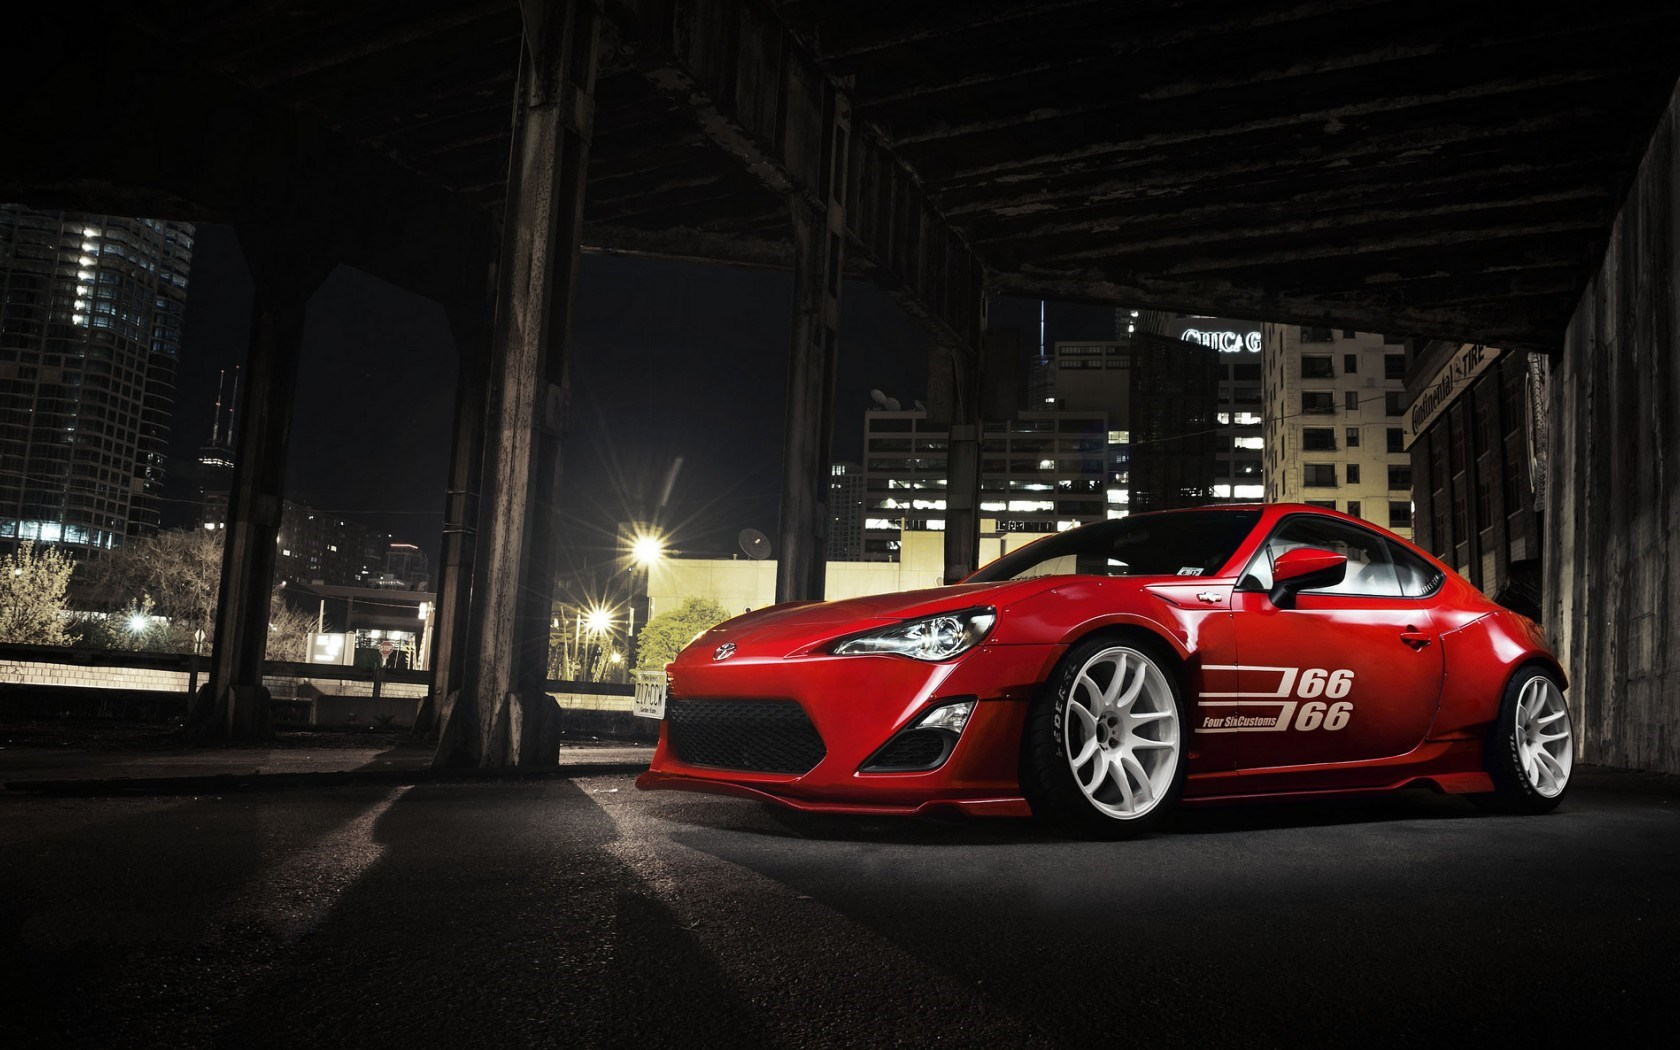 Mazda Furai Vehículos Supercars Hd Fondos De Pantalla: Toyota GT86 Wallpapers (60 Wallpapers)